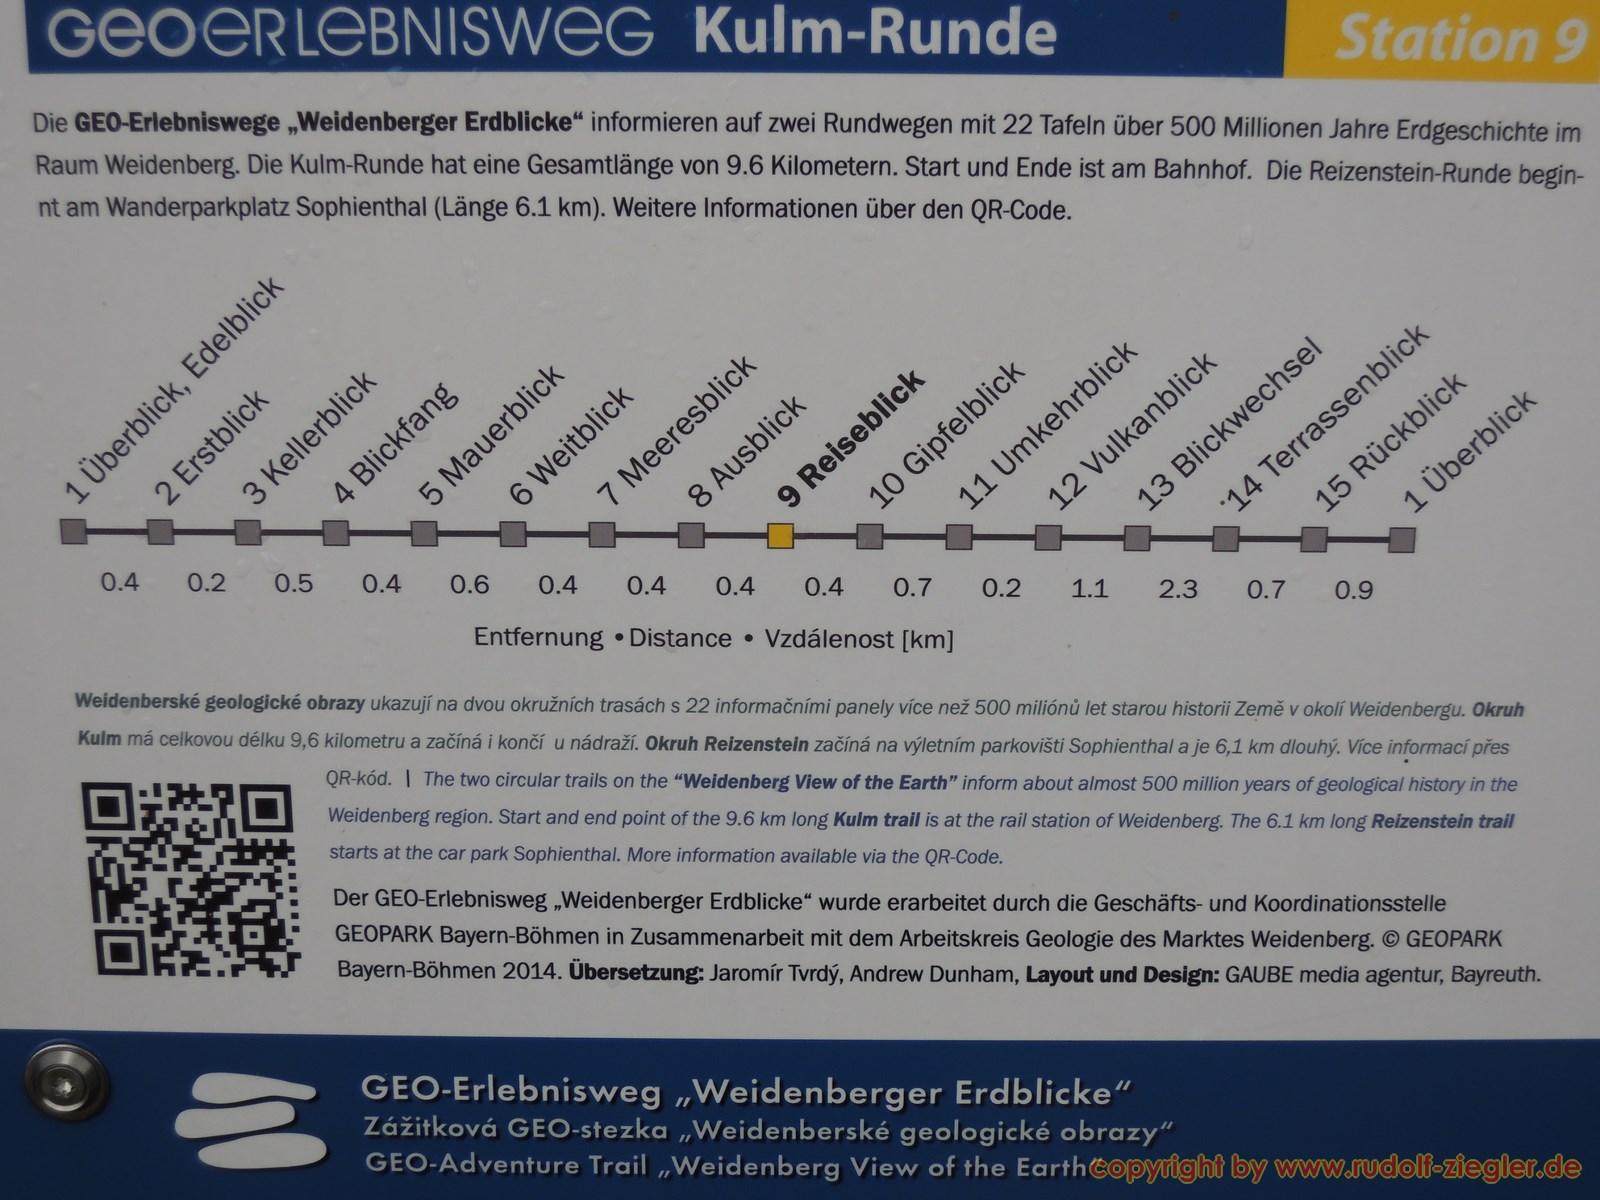 Kulm Runde - bei Weidenberg 006 [1600x1200]